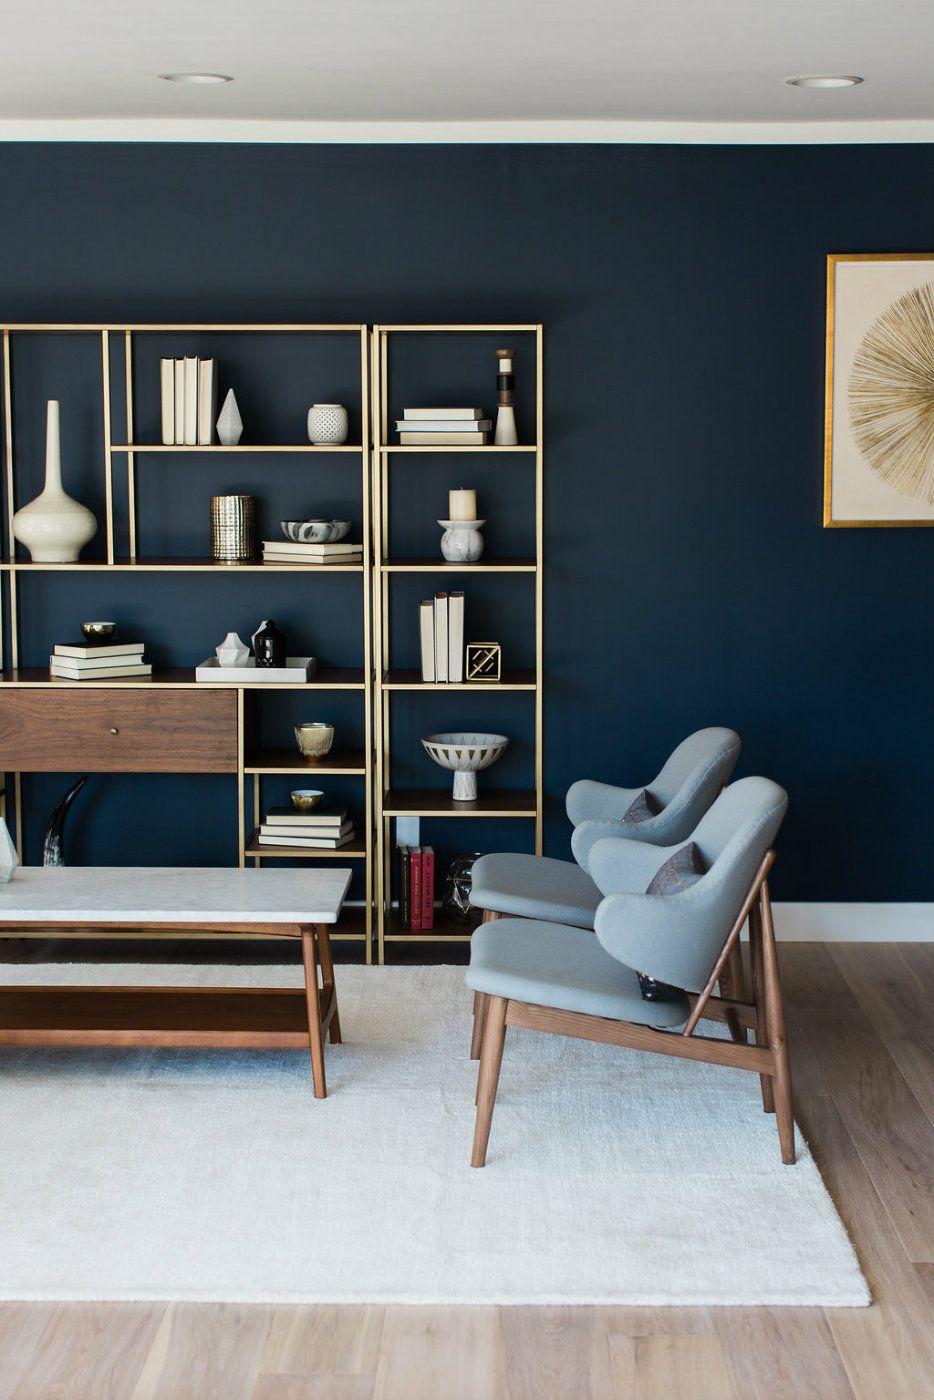 Lindye Galloway Design - MID CENTURY MOD living room with navy blue walls